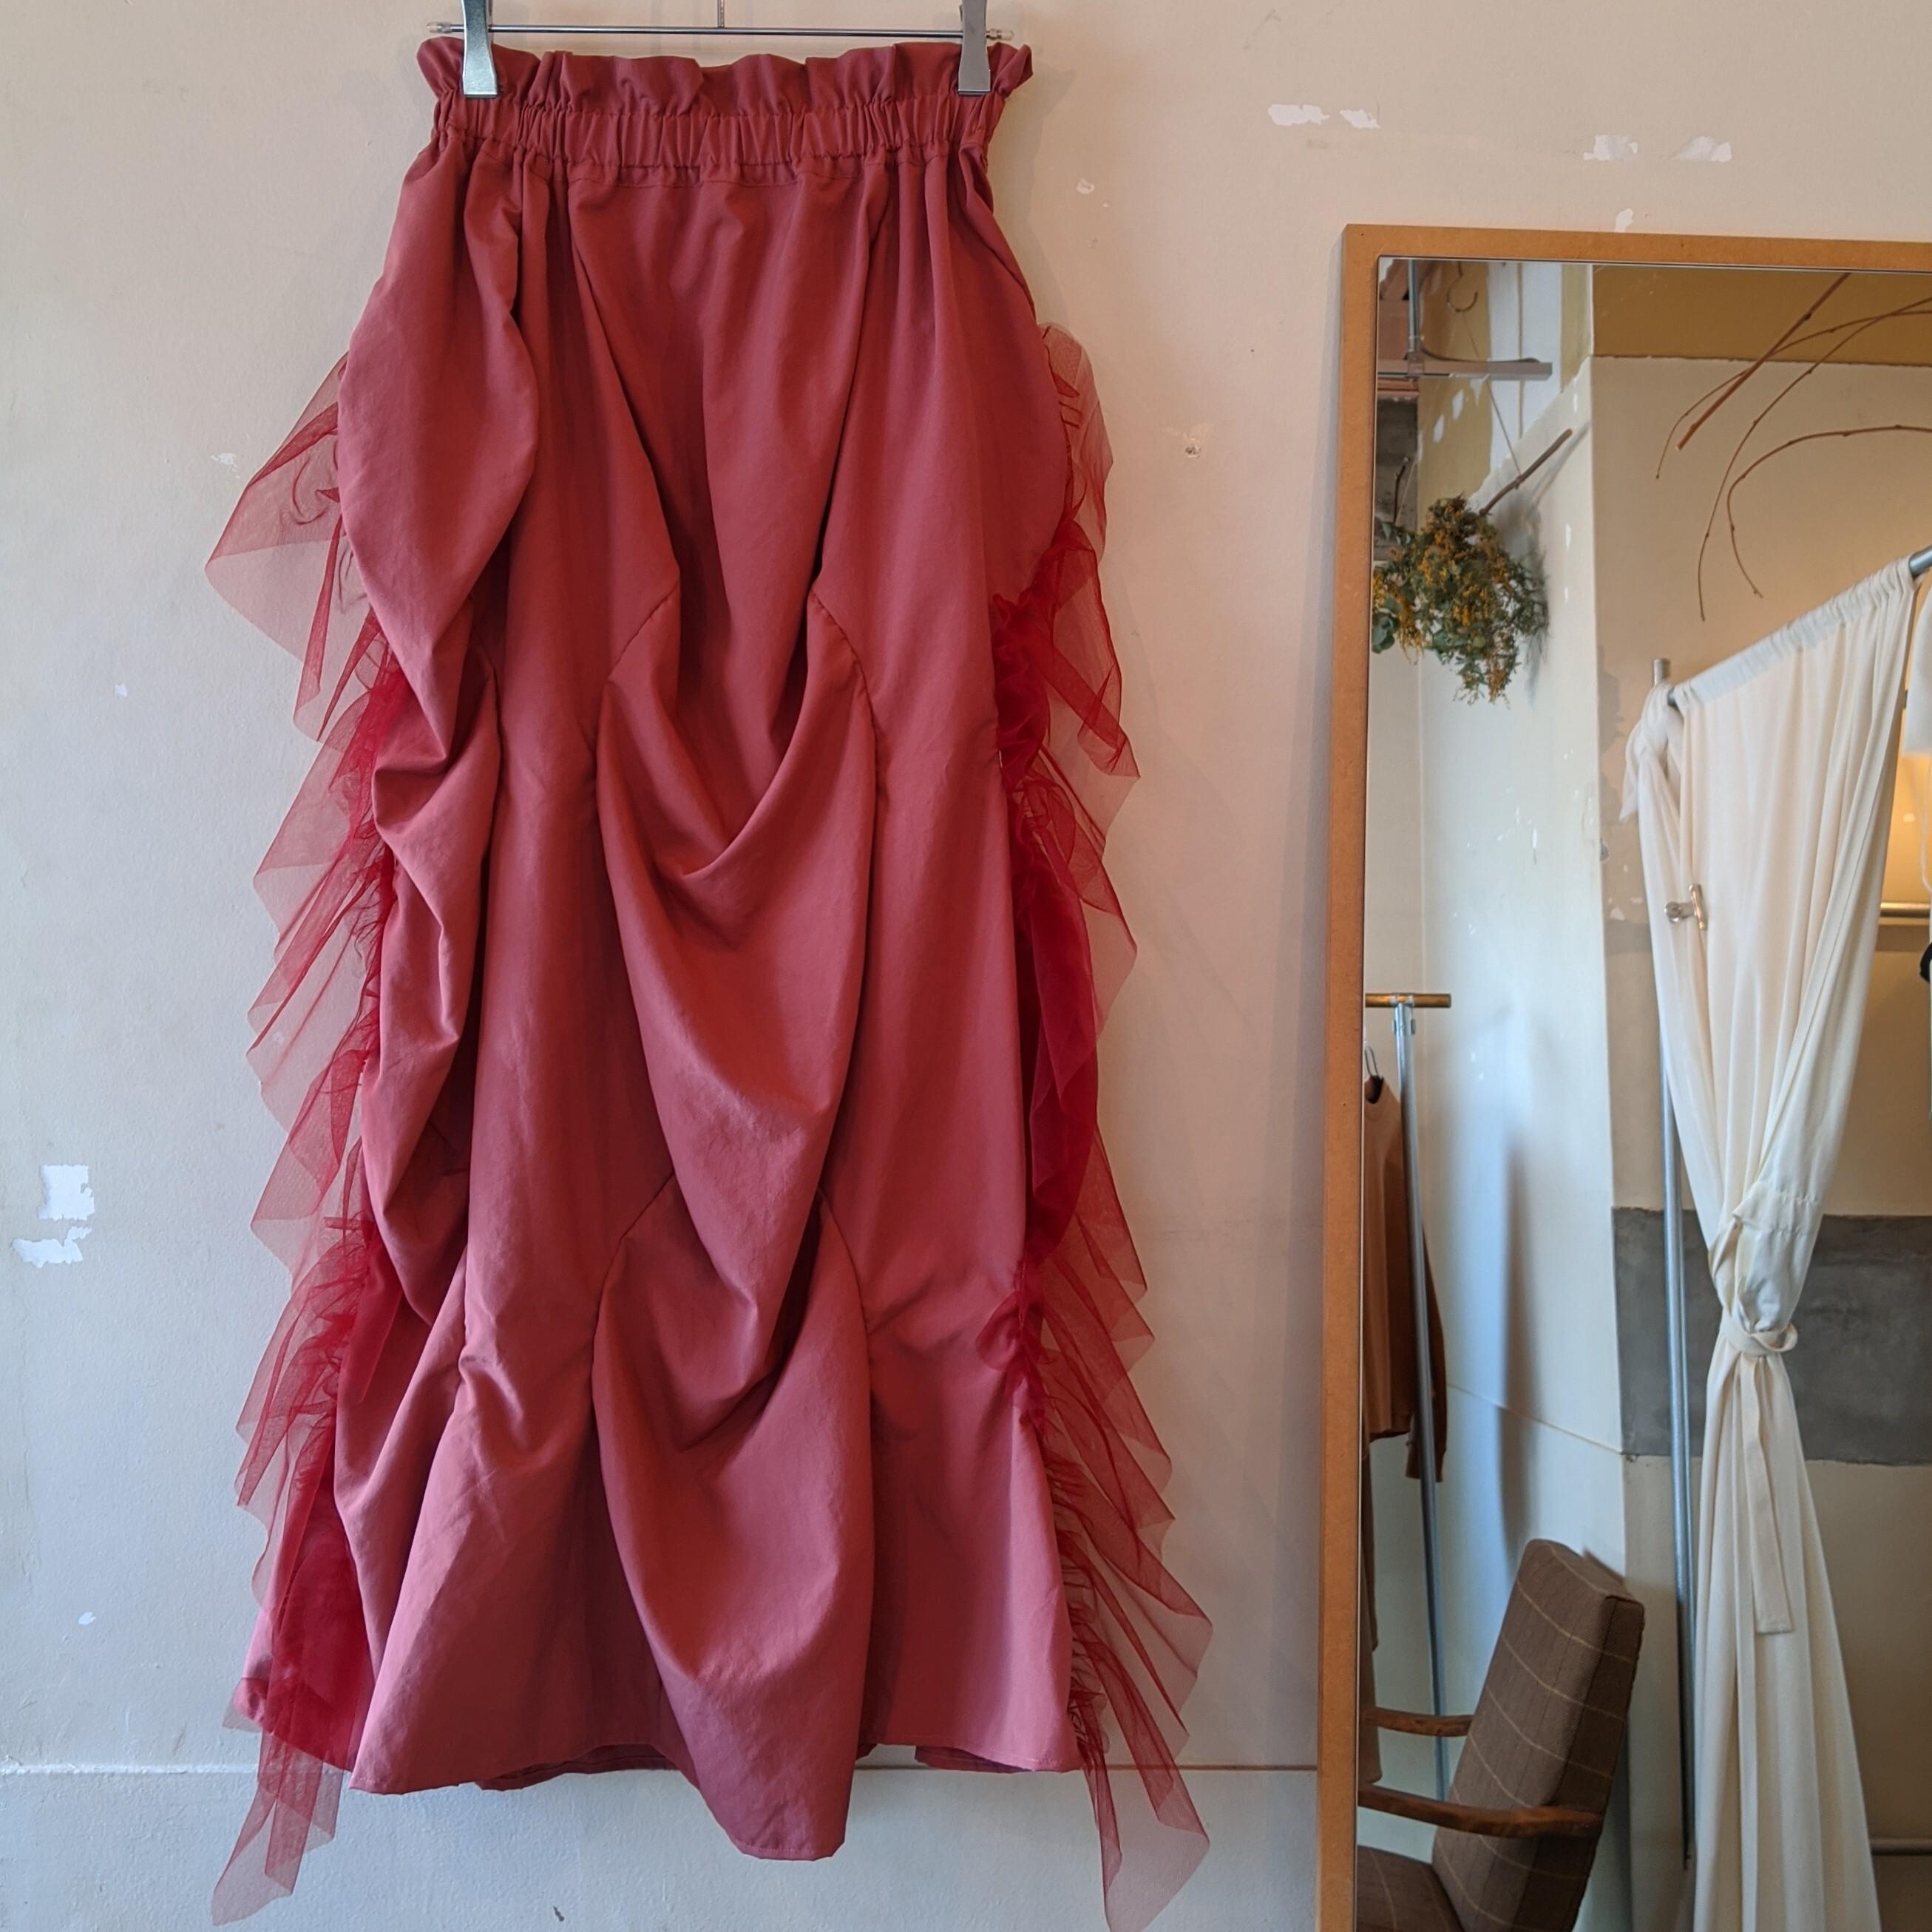 【 HOUGA 】ホウガ turip skirt  / チューリップスカート PINK